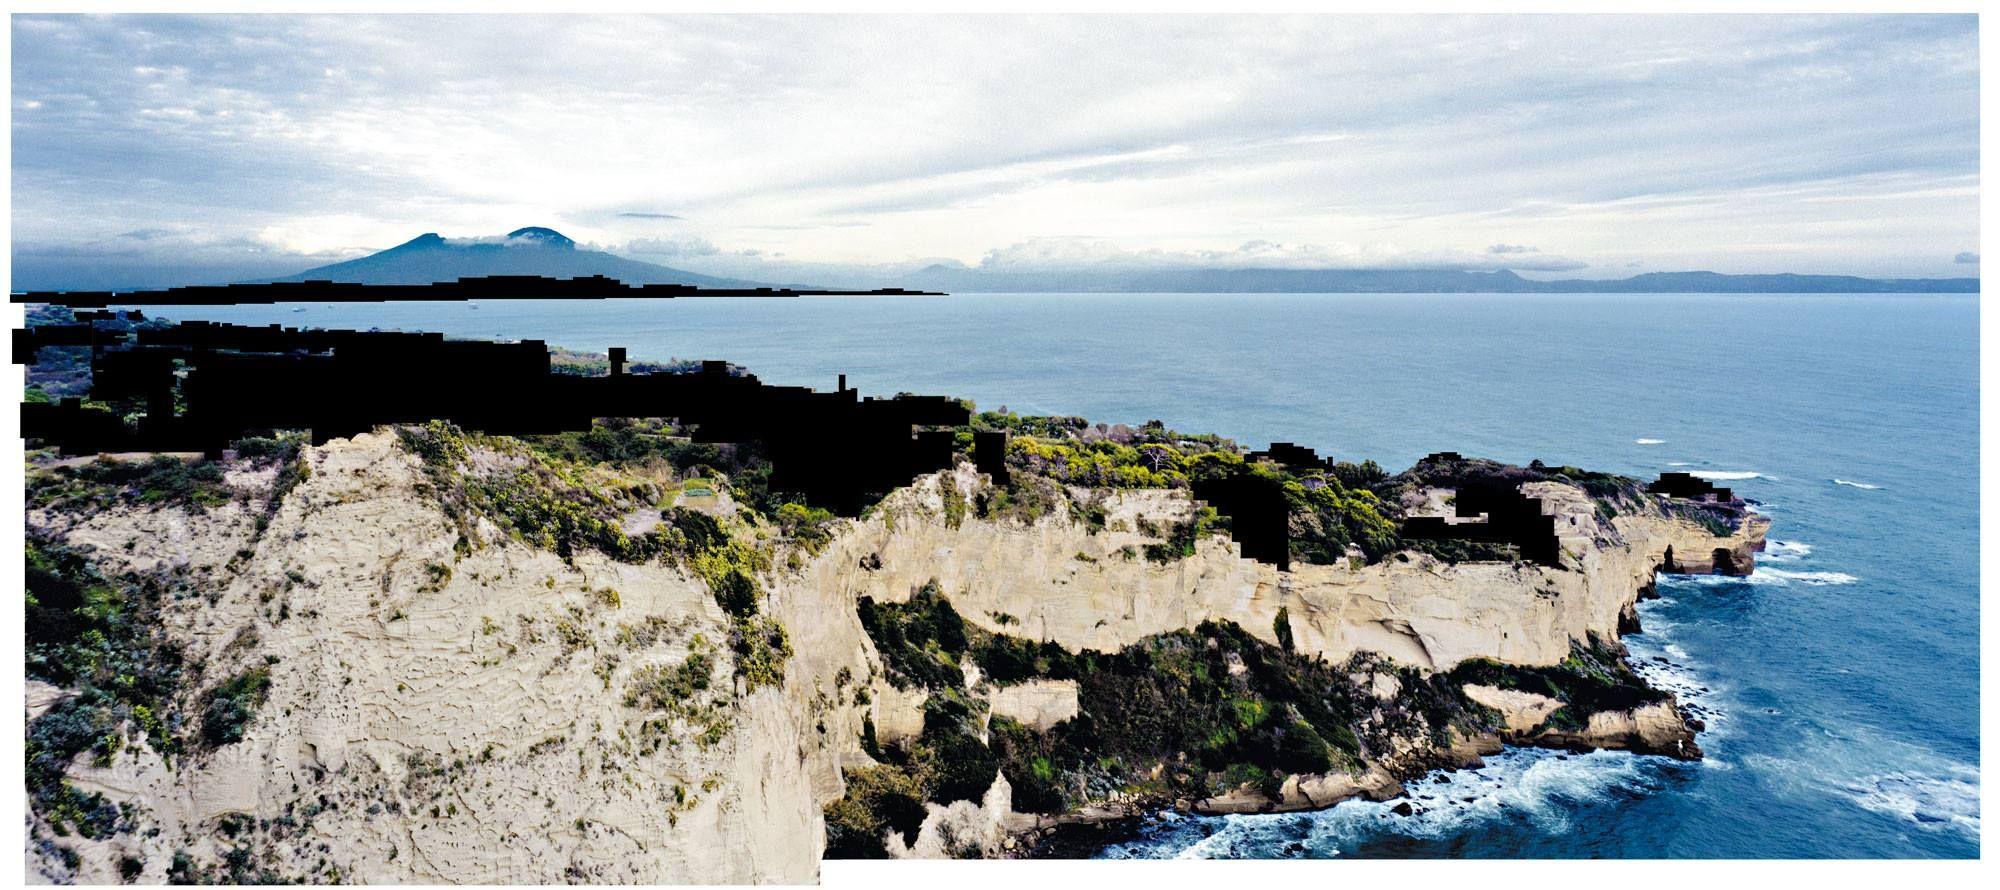 Beniamino Servino. Anonymous seascape. [Based on a photo by Francesco Jodice].